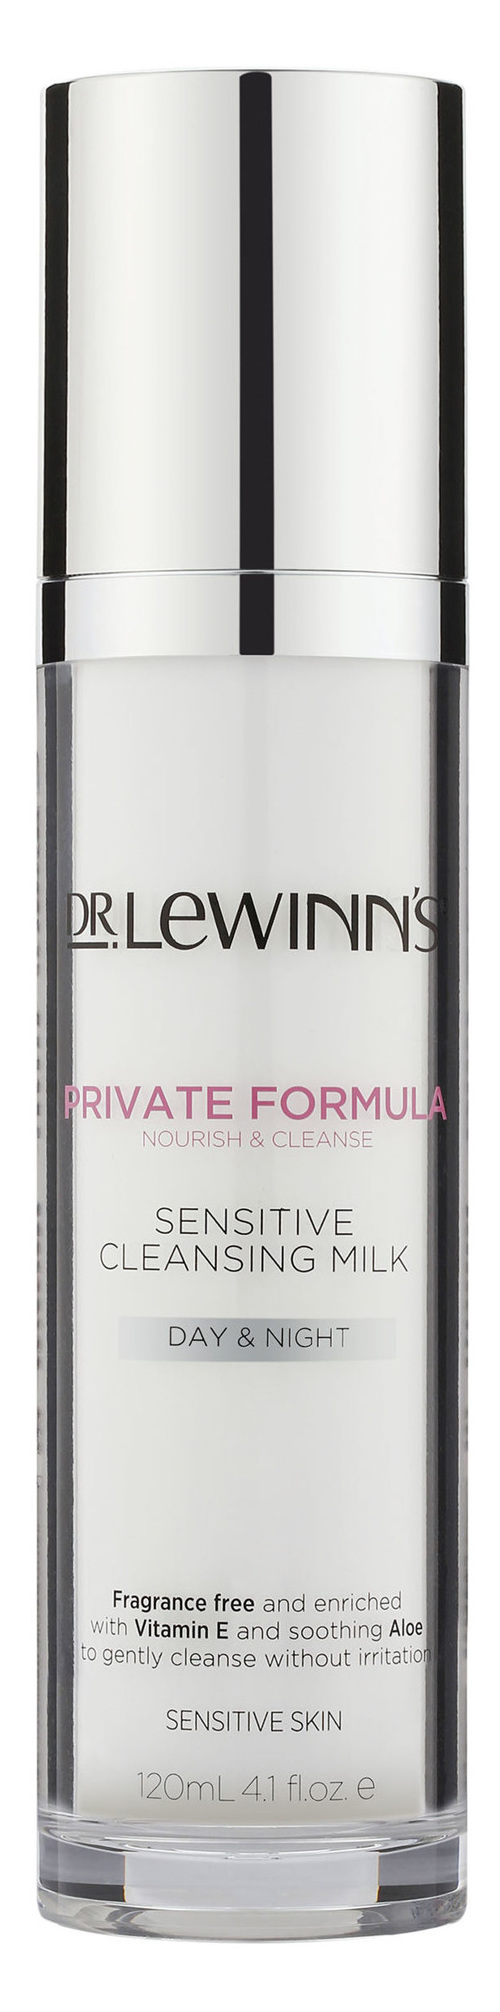 DLW PF Sensitive Cleansing Milk 120ml